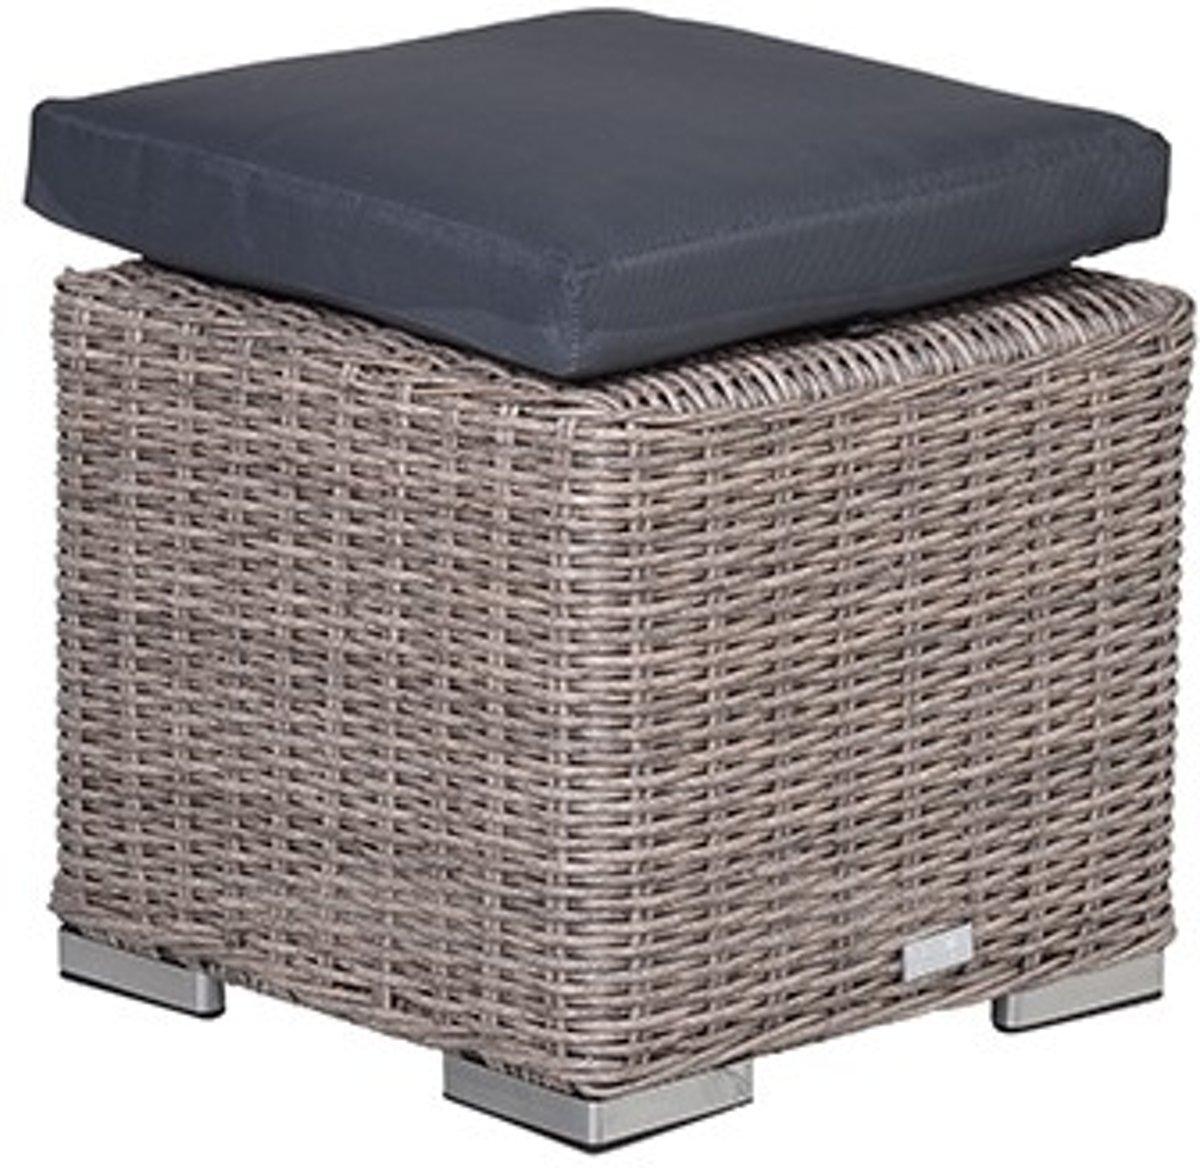 Garden Impressions - Tennessee hocker - 45x45 - organic grey/antraciet kopen